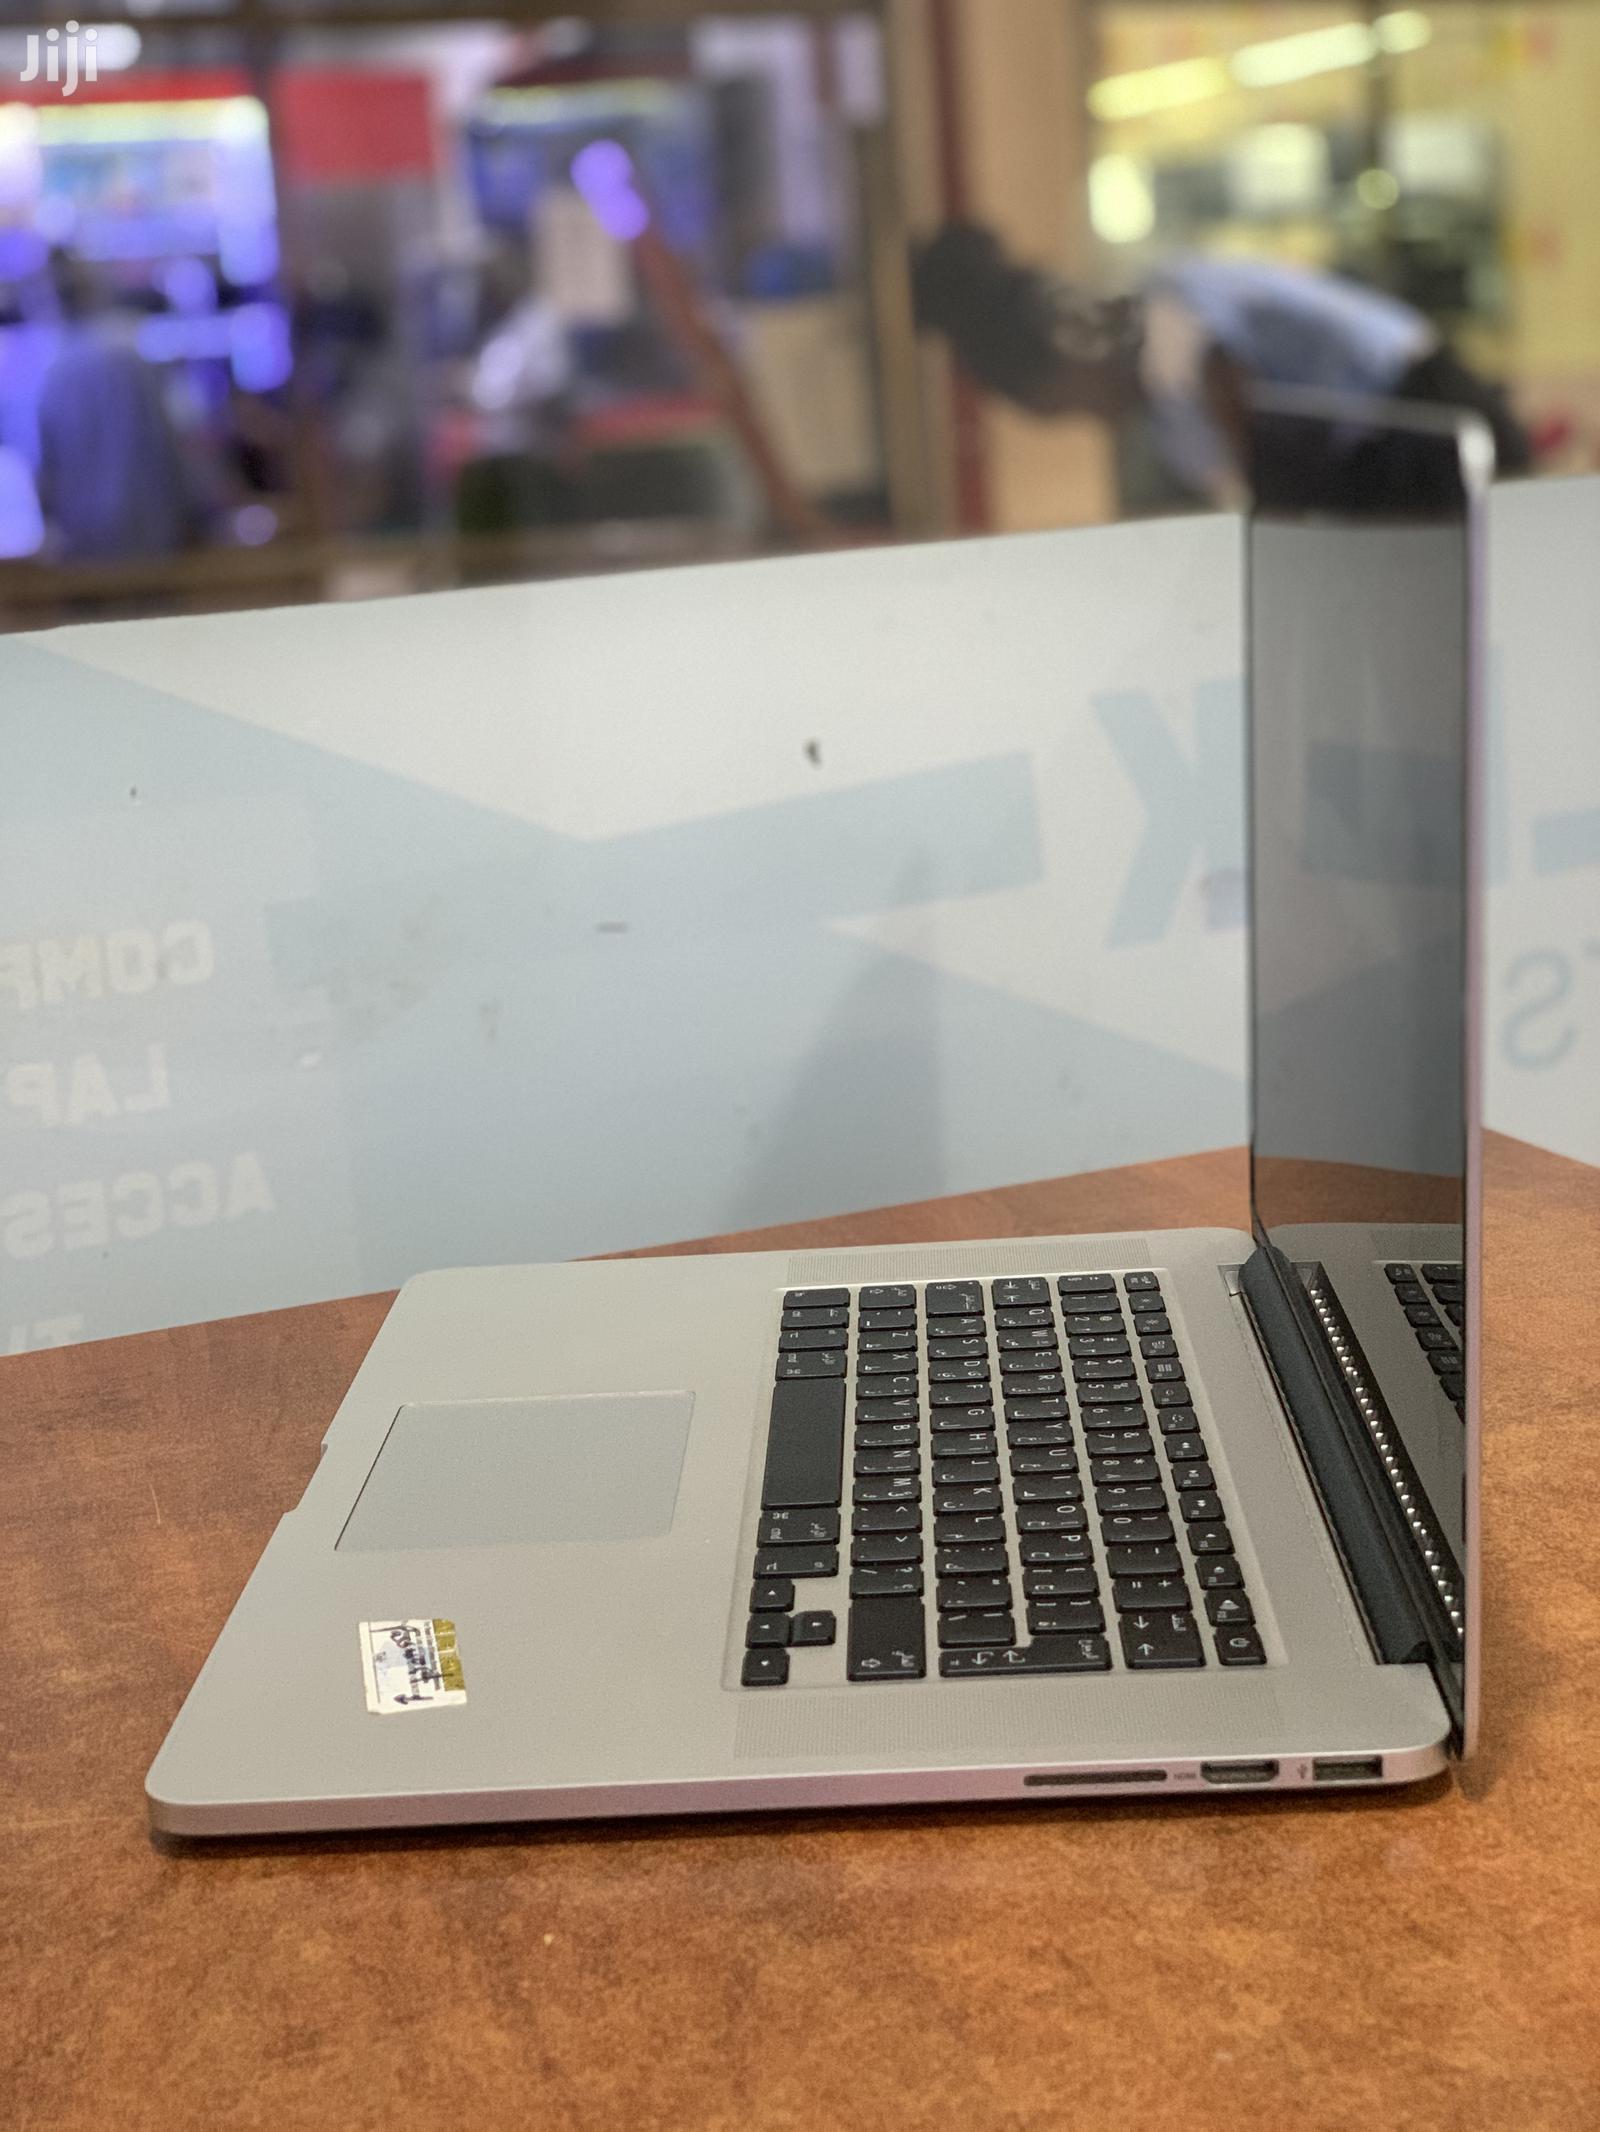 Archive: Laptop Apple MacBook Pro 16GB Intel Core I7 SSHD (Hybrid) 512GB